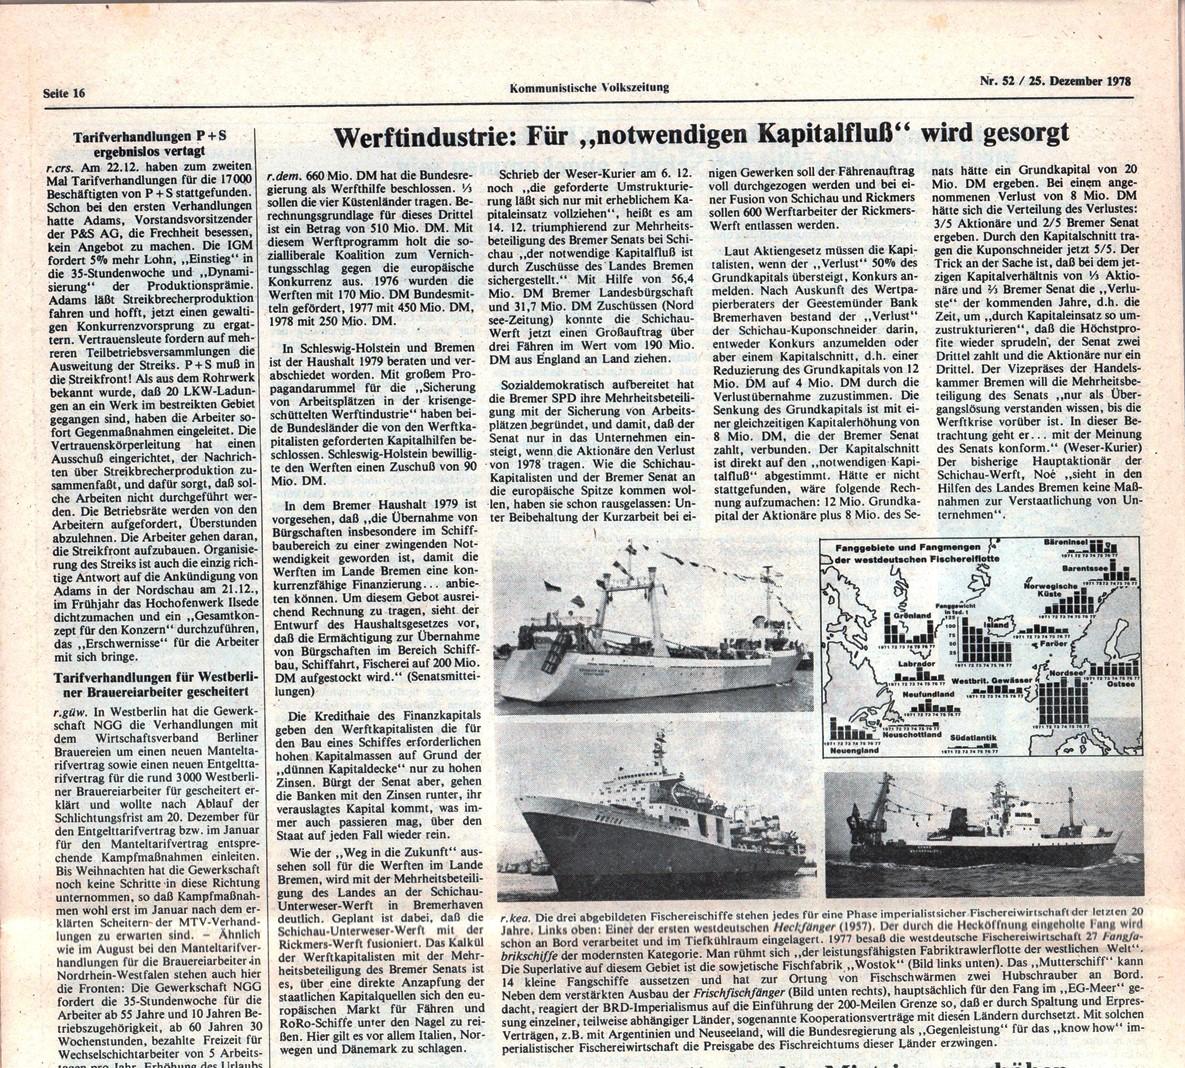 Hamburg_KVZ_1978_52_31